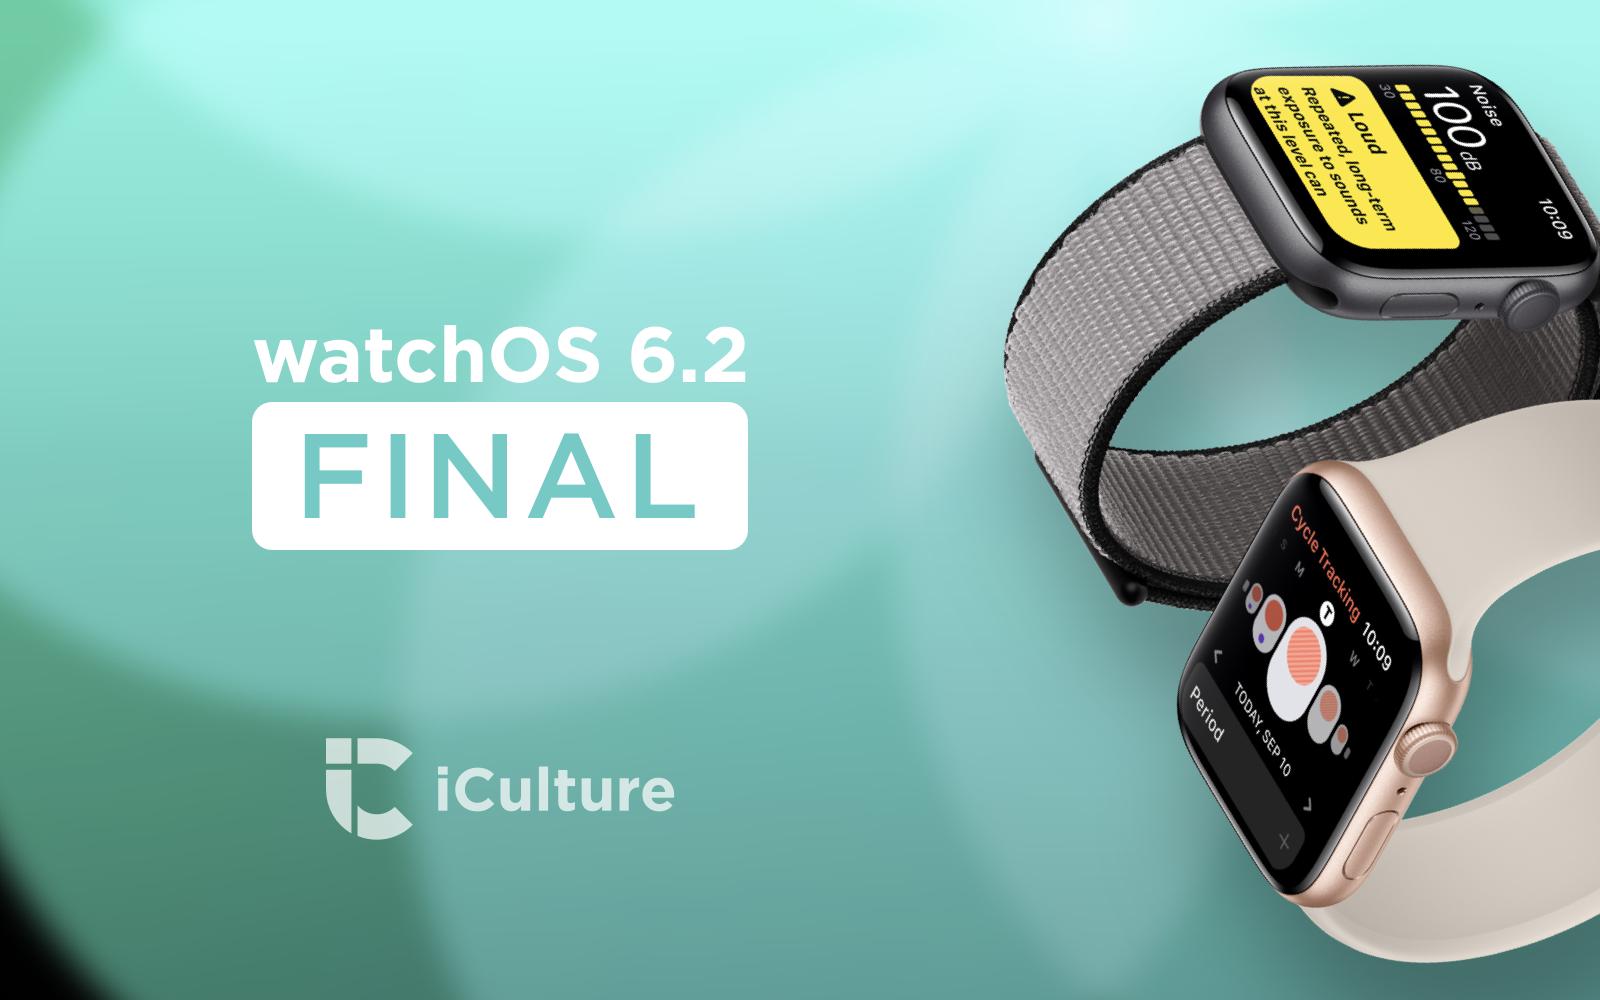 watchOS 6.2 final.